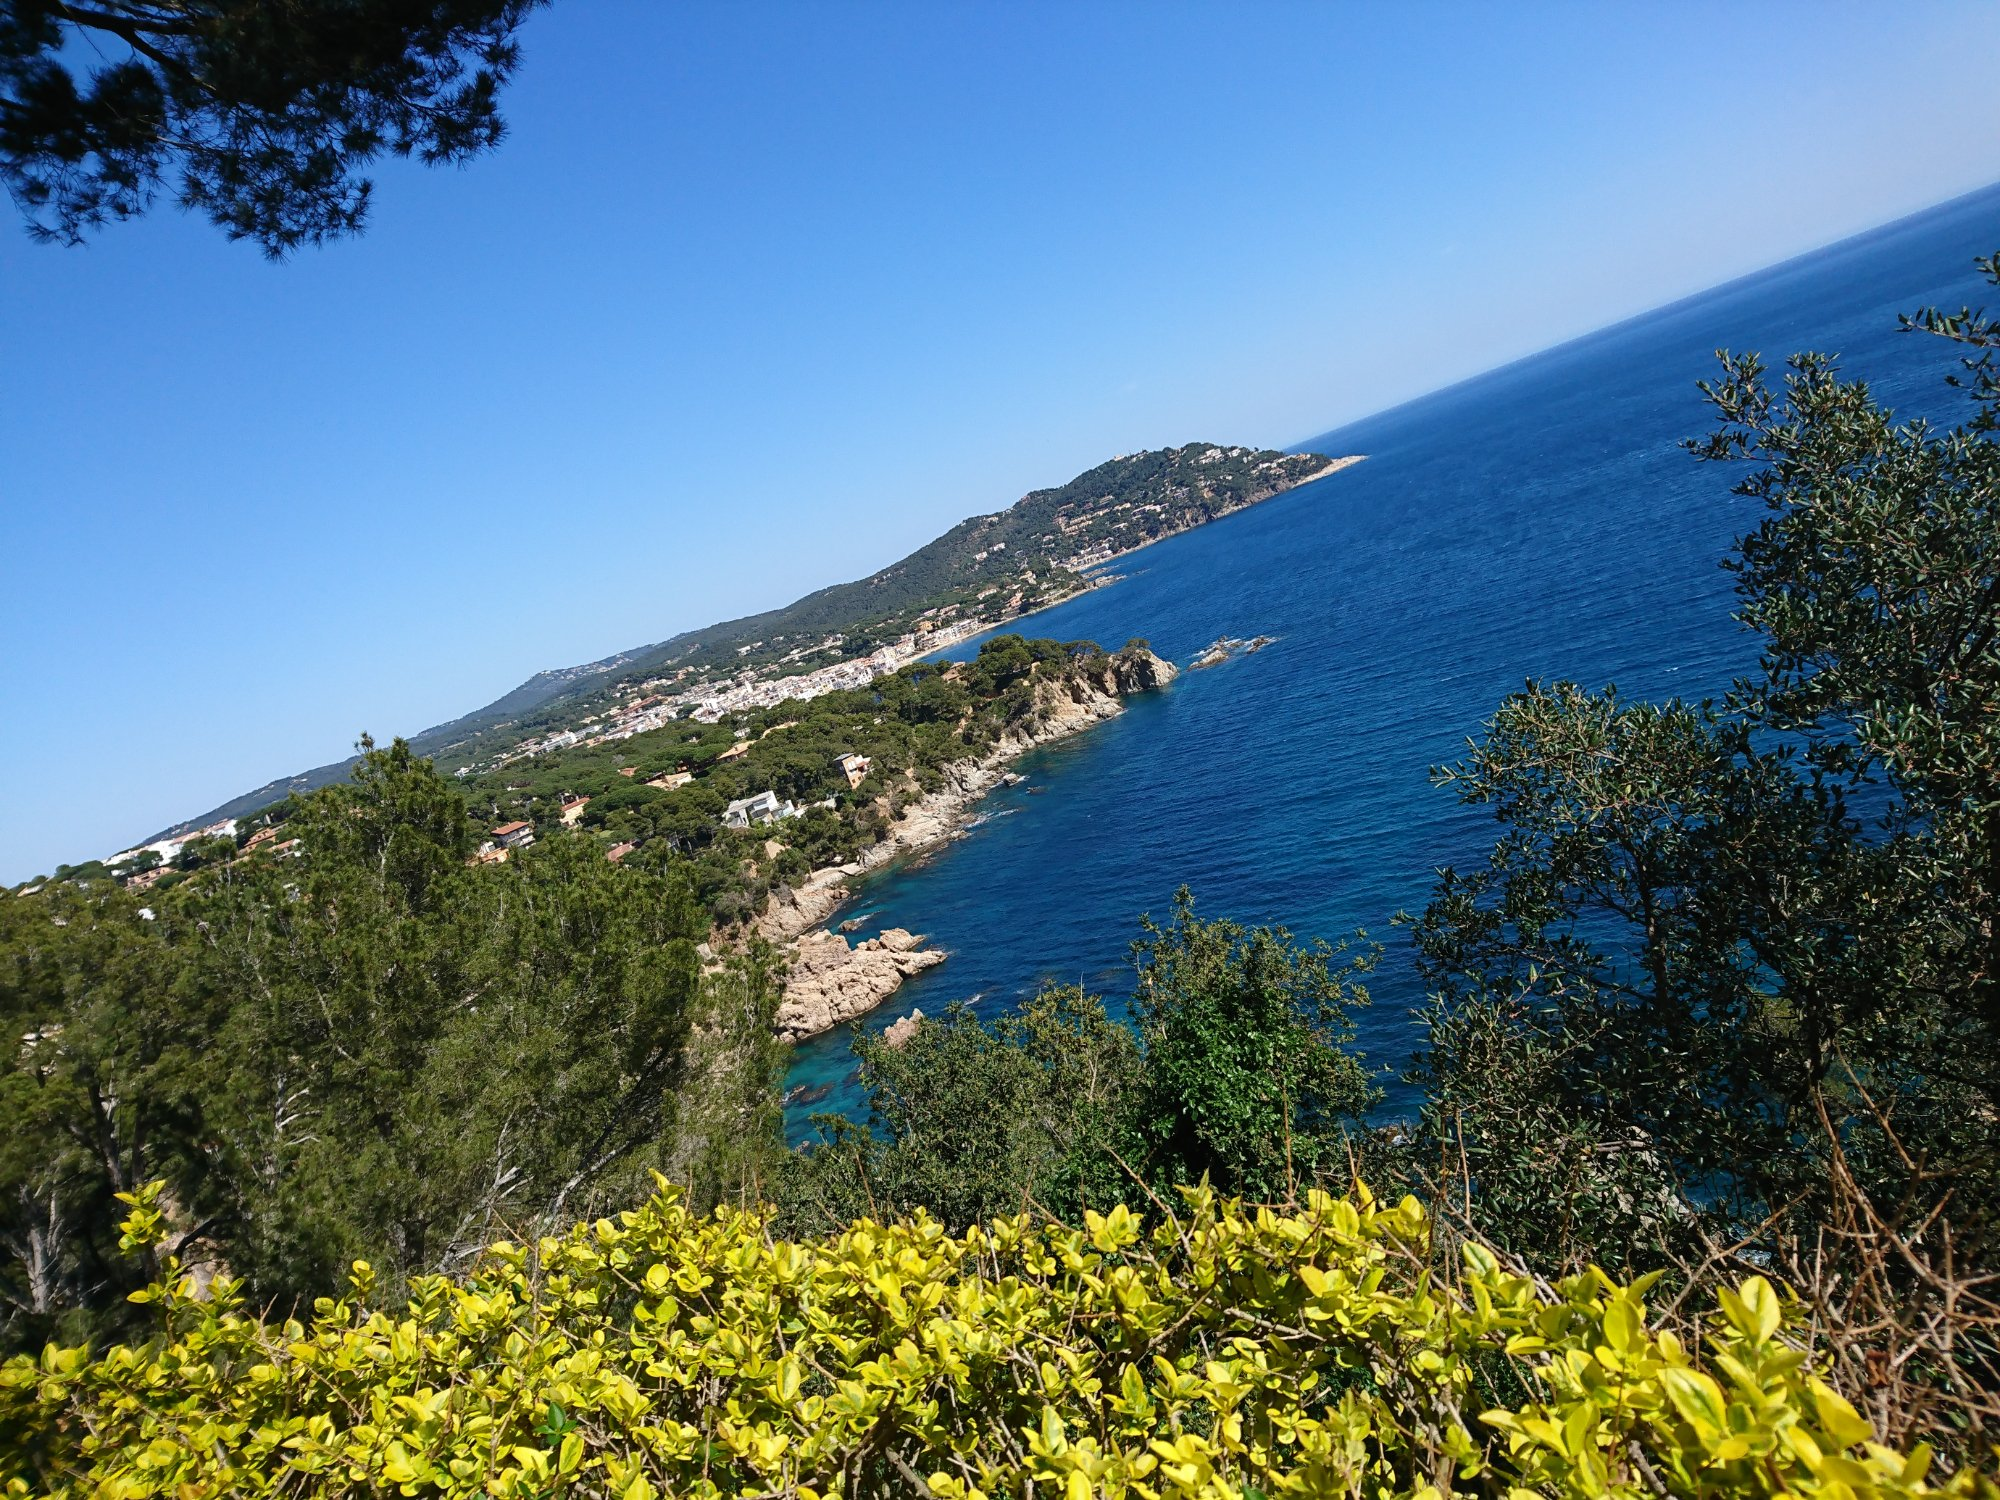 Jardi Botanic de Cap Roig (Calella de Palafrugell, Spania) - Anmeldelser